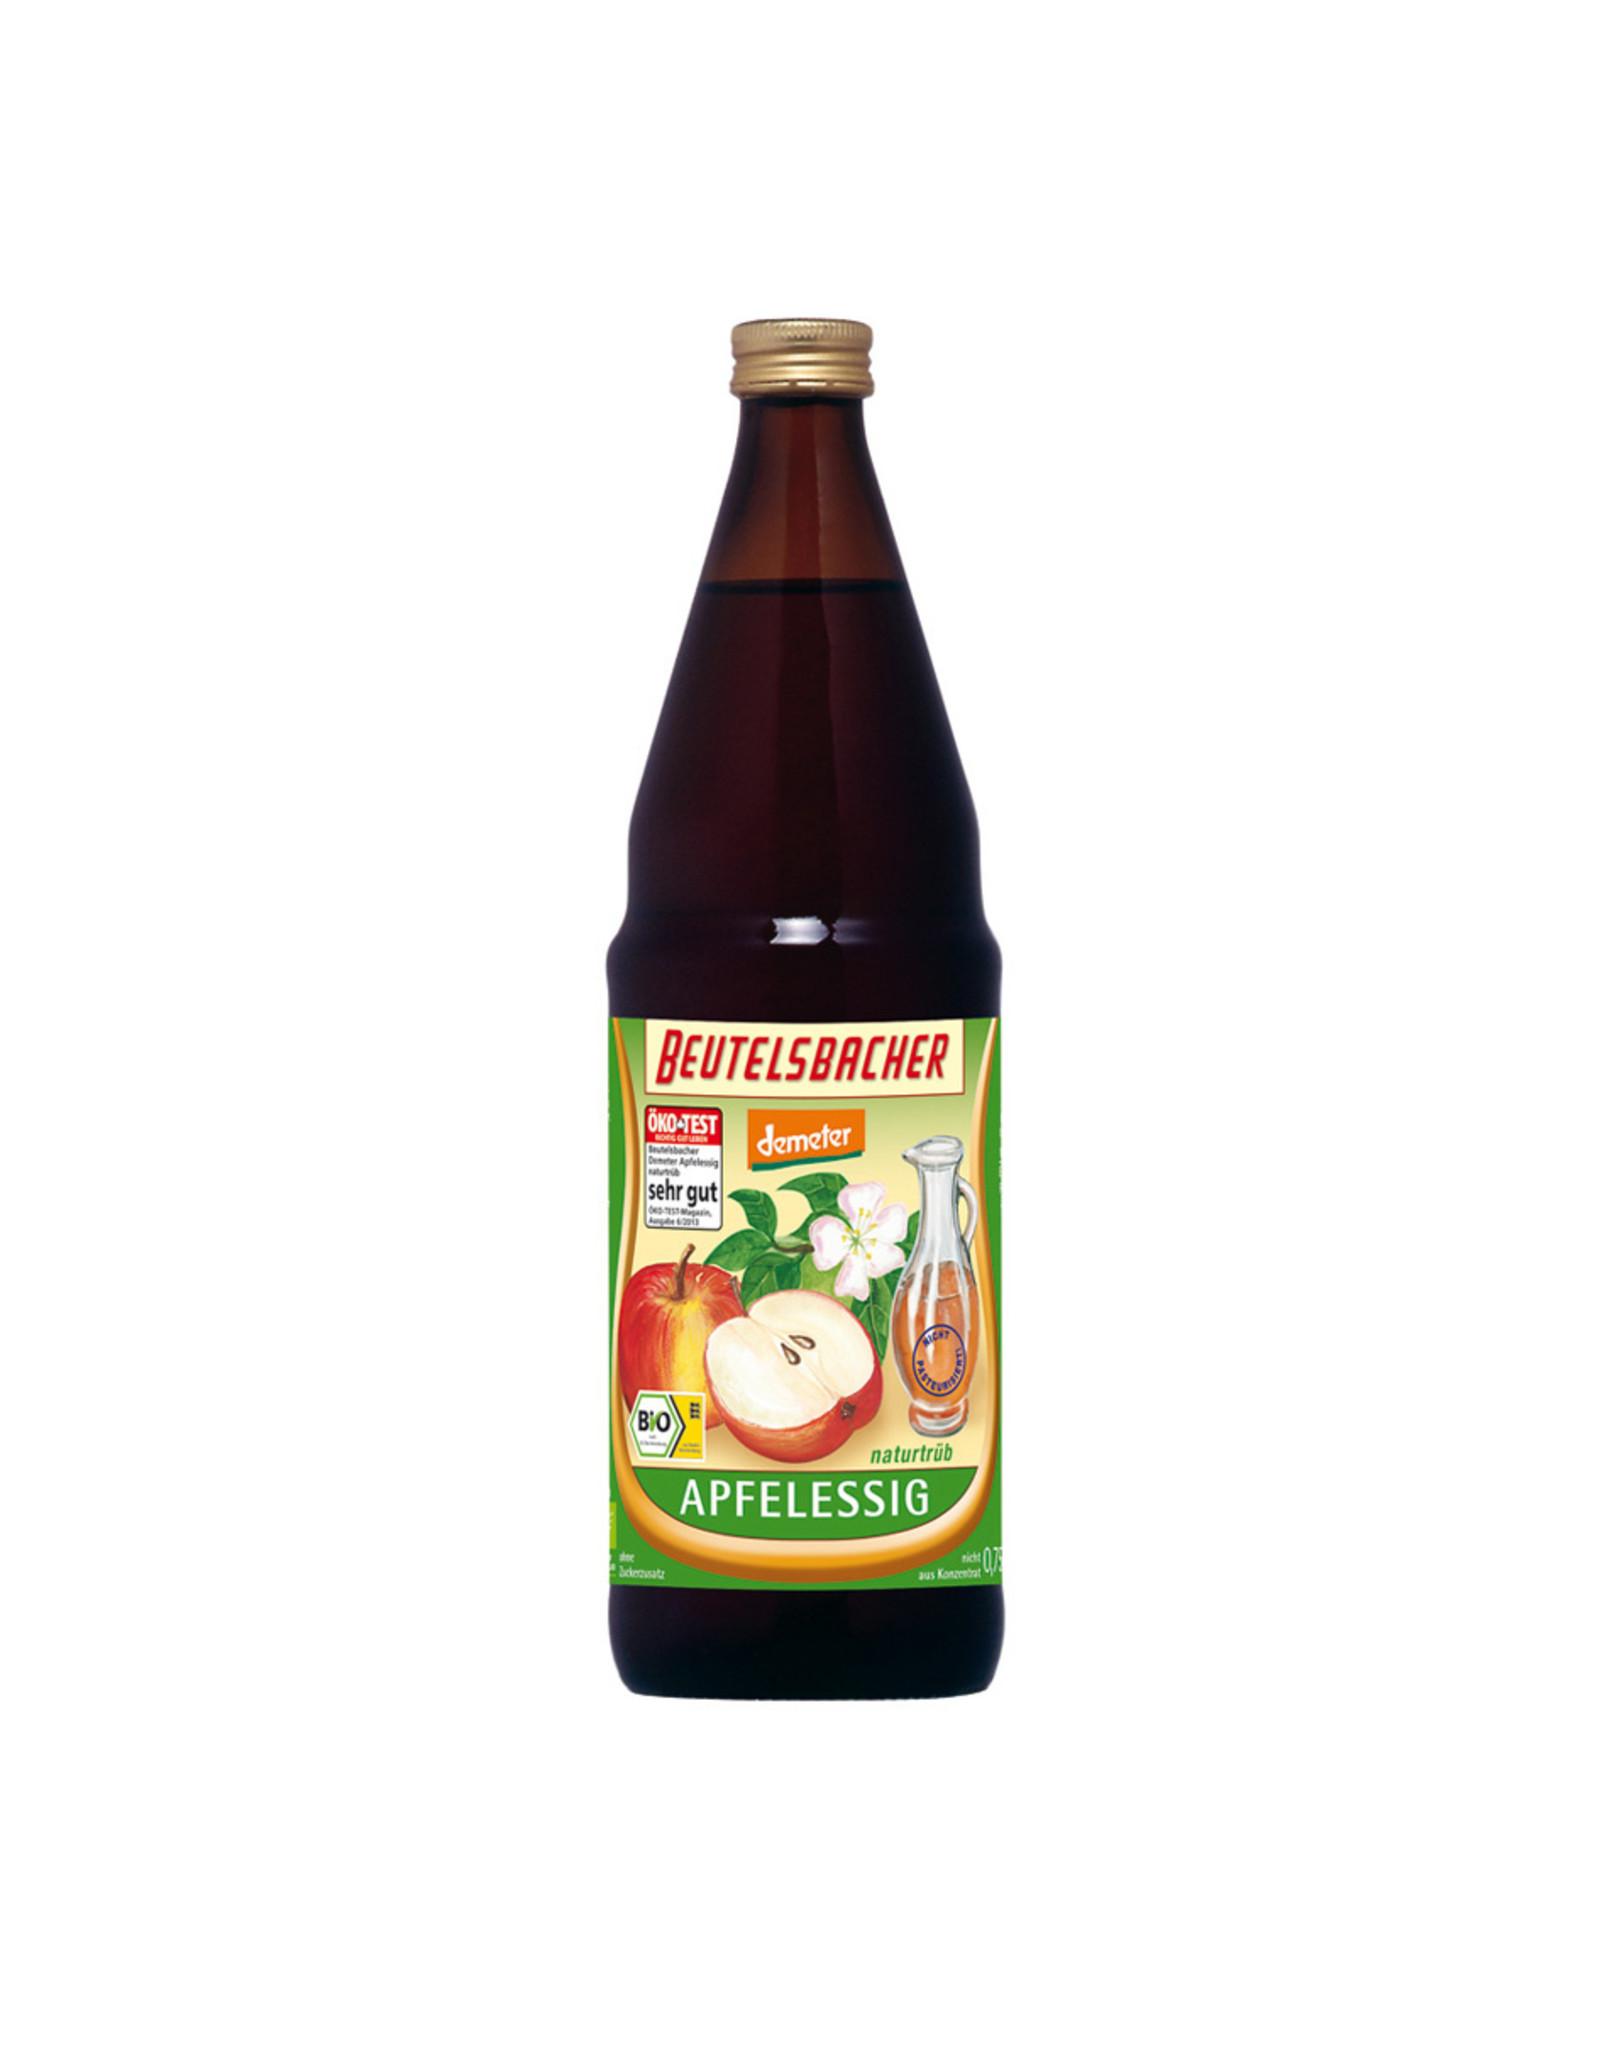 Beutelsbacher Apfelessig naturtrüb demeter 750ml